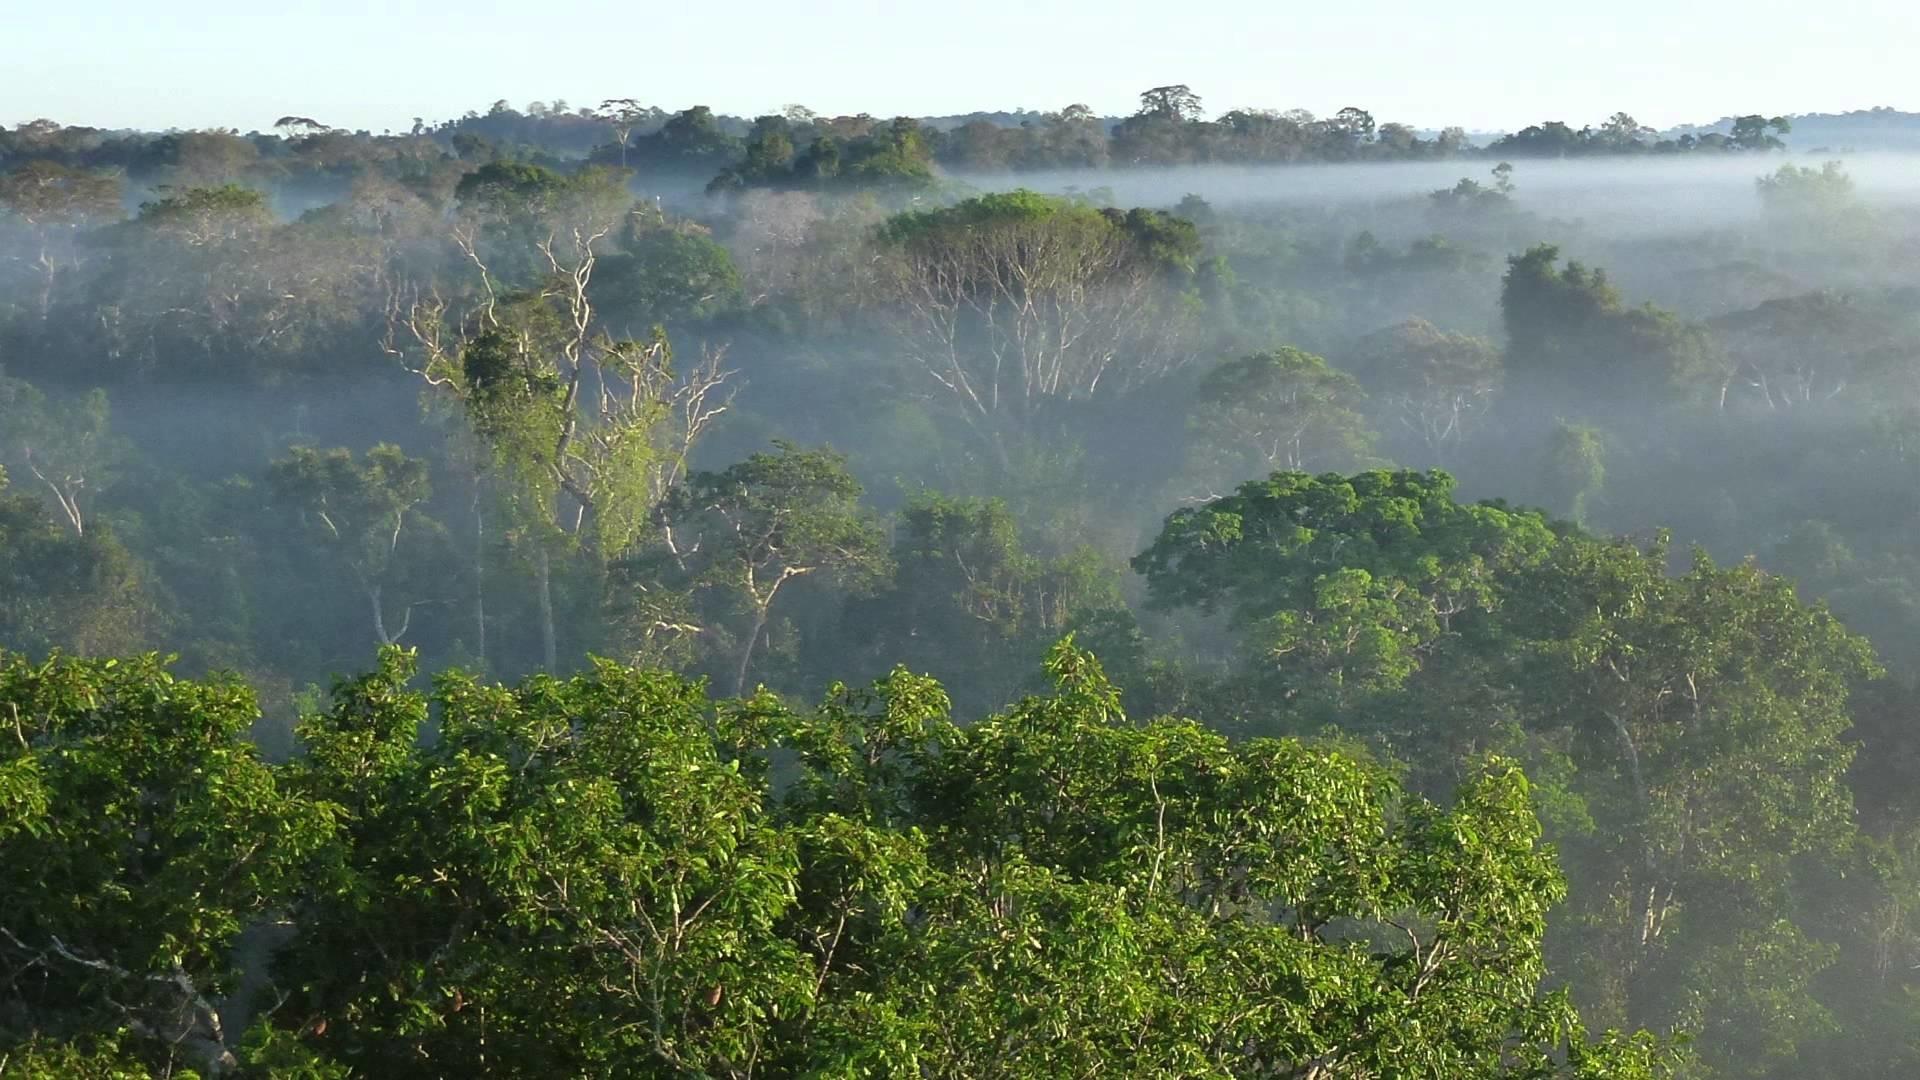 леса амазонки картинка ванили происходит